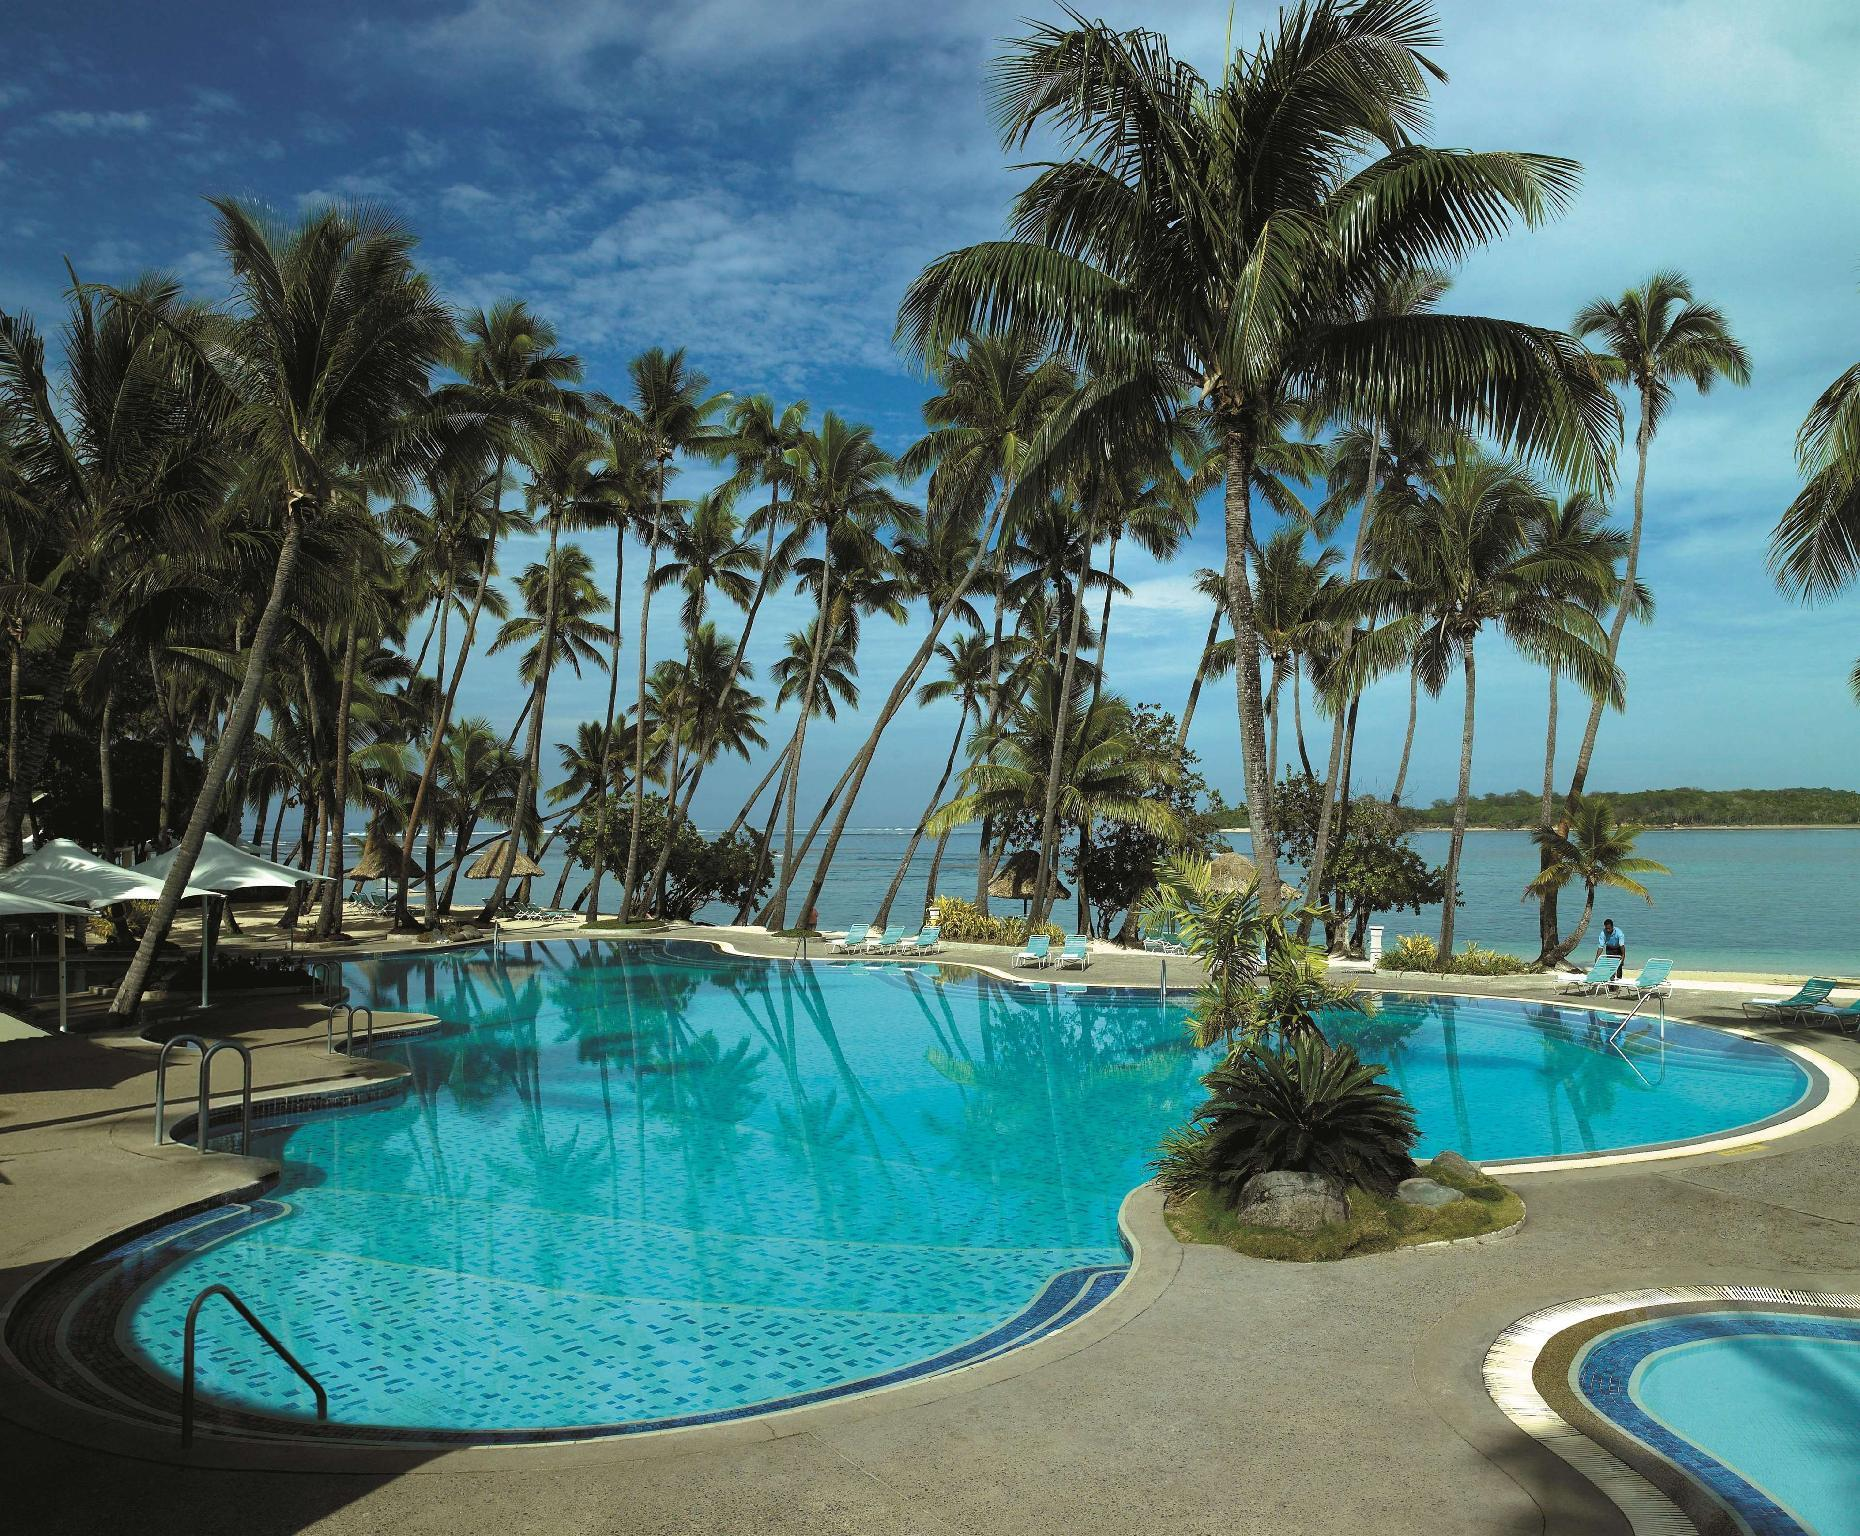 Shangri-La Fijian Resort and Spa, Nadroga/Navosa